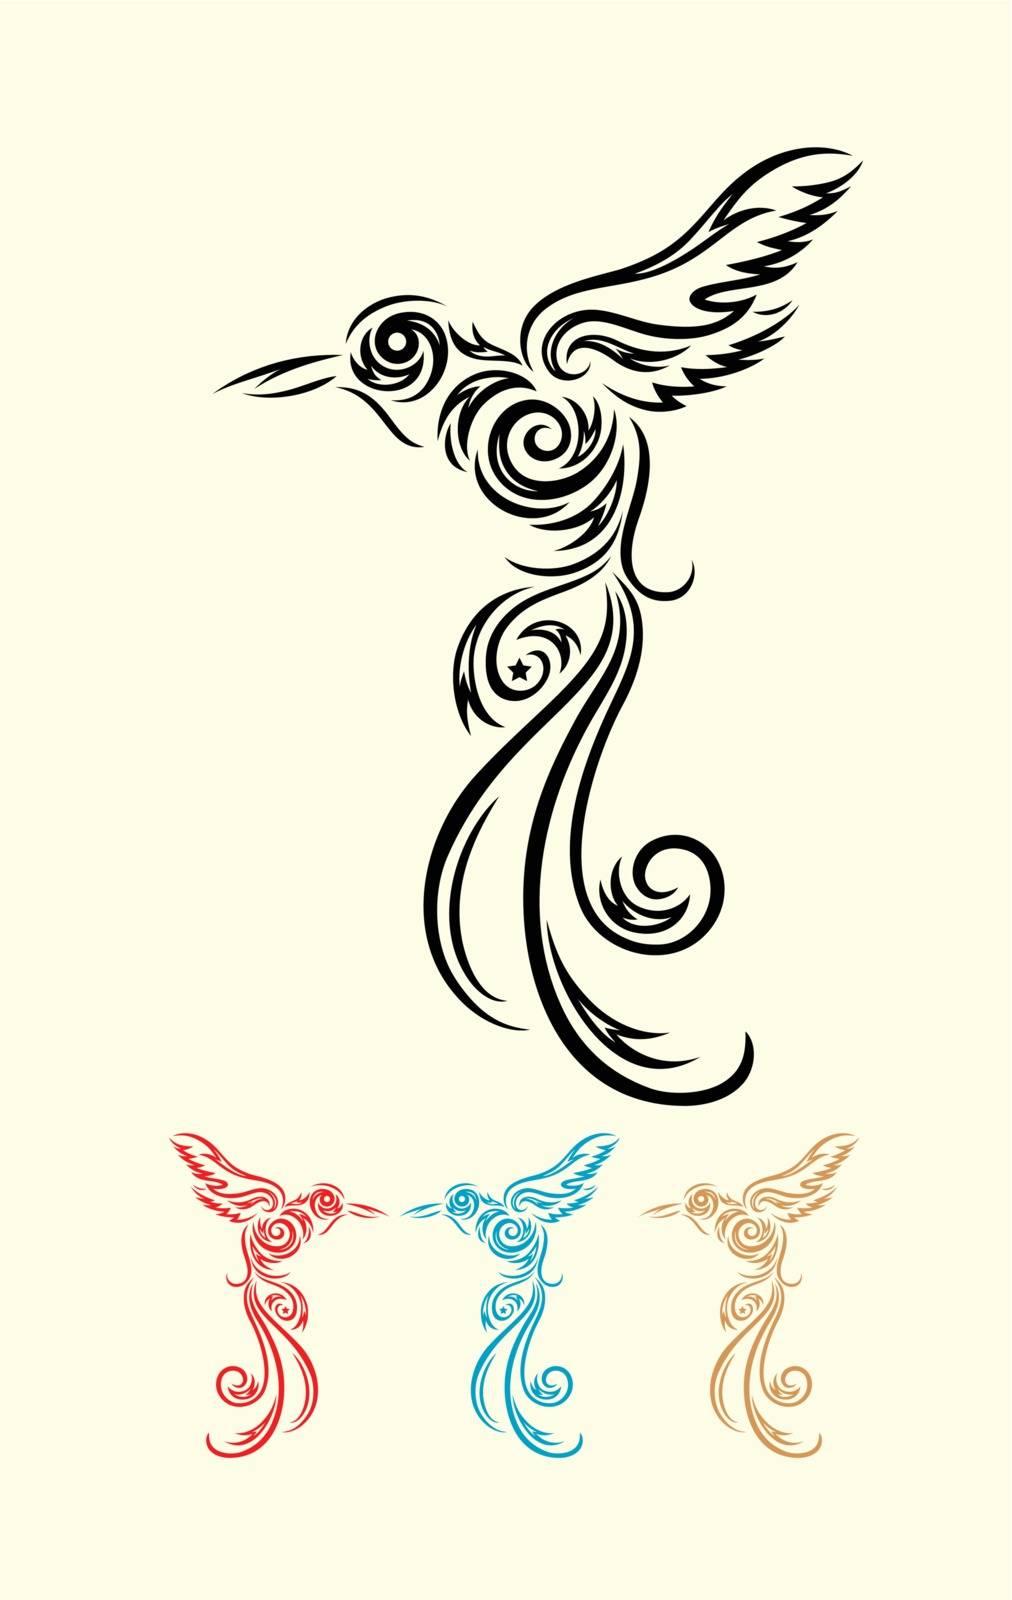 Humming bird ornate tribal tattoo, art vector decoration